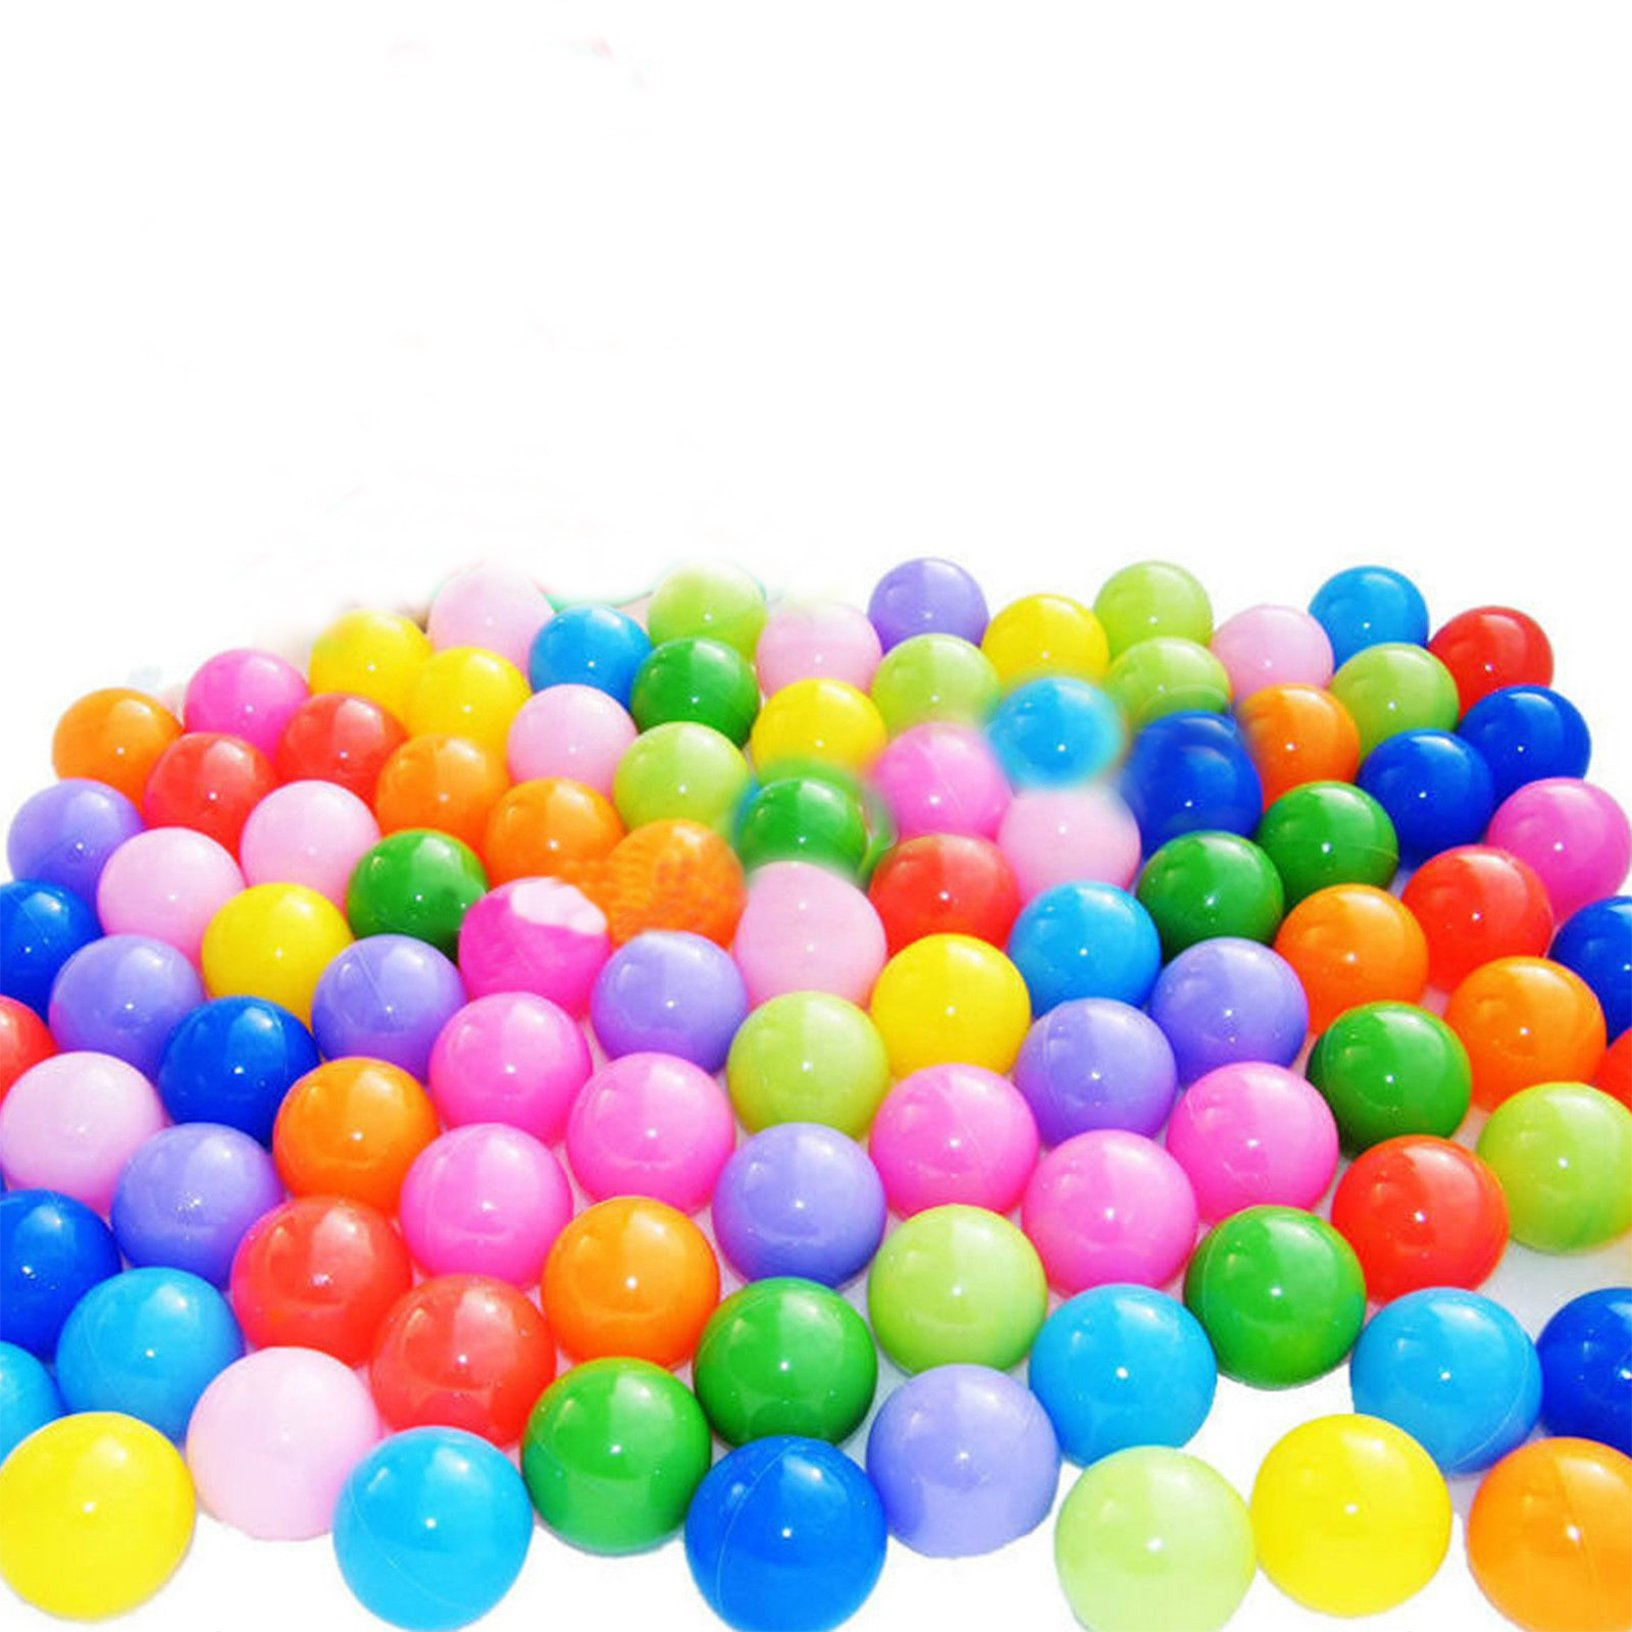 toyofmine Ocean Balls Baby Kid Swim Pit Toy Colorful Soft Plastic Bulk Pack (50-1000 pcs)